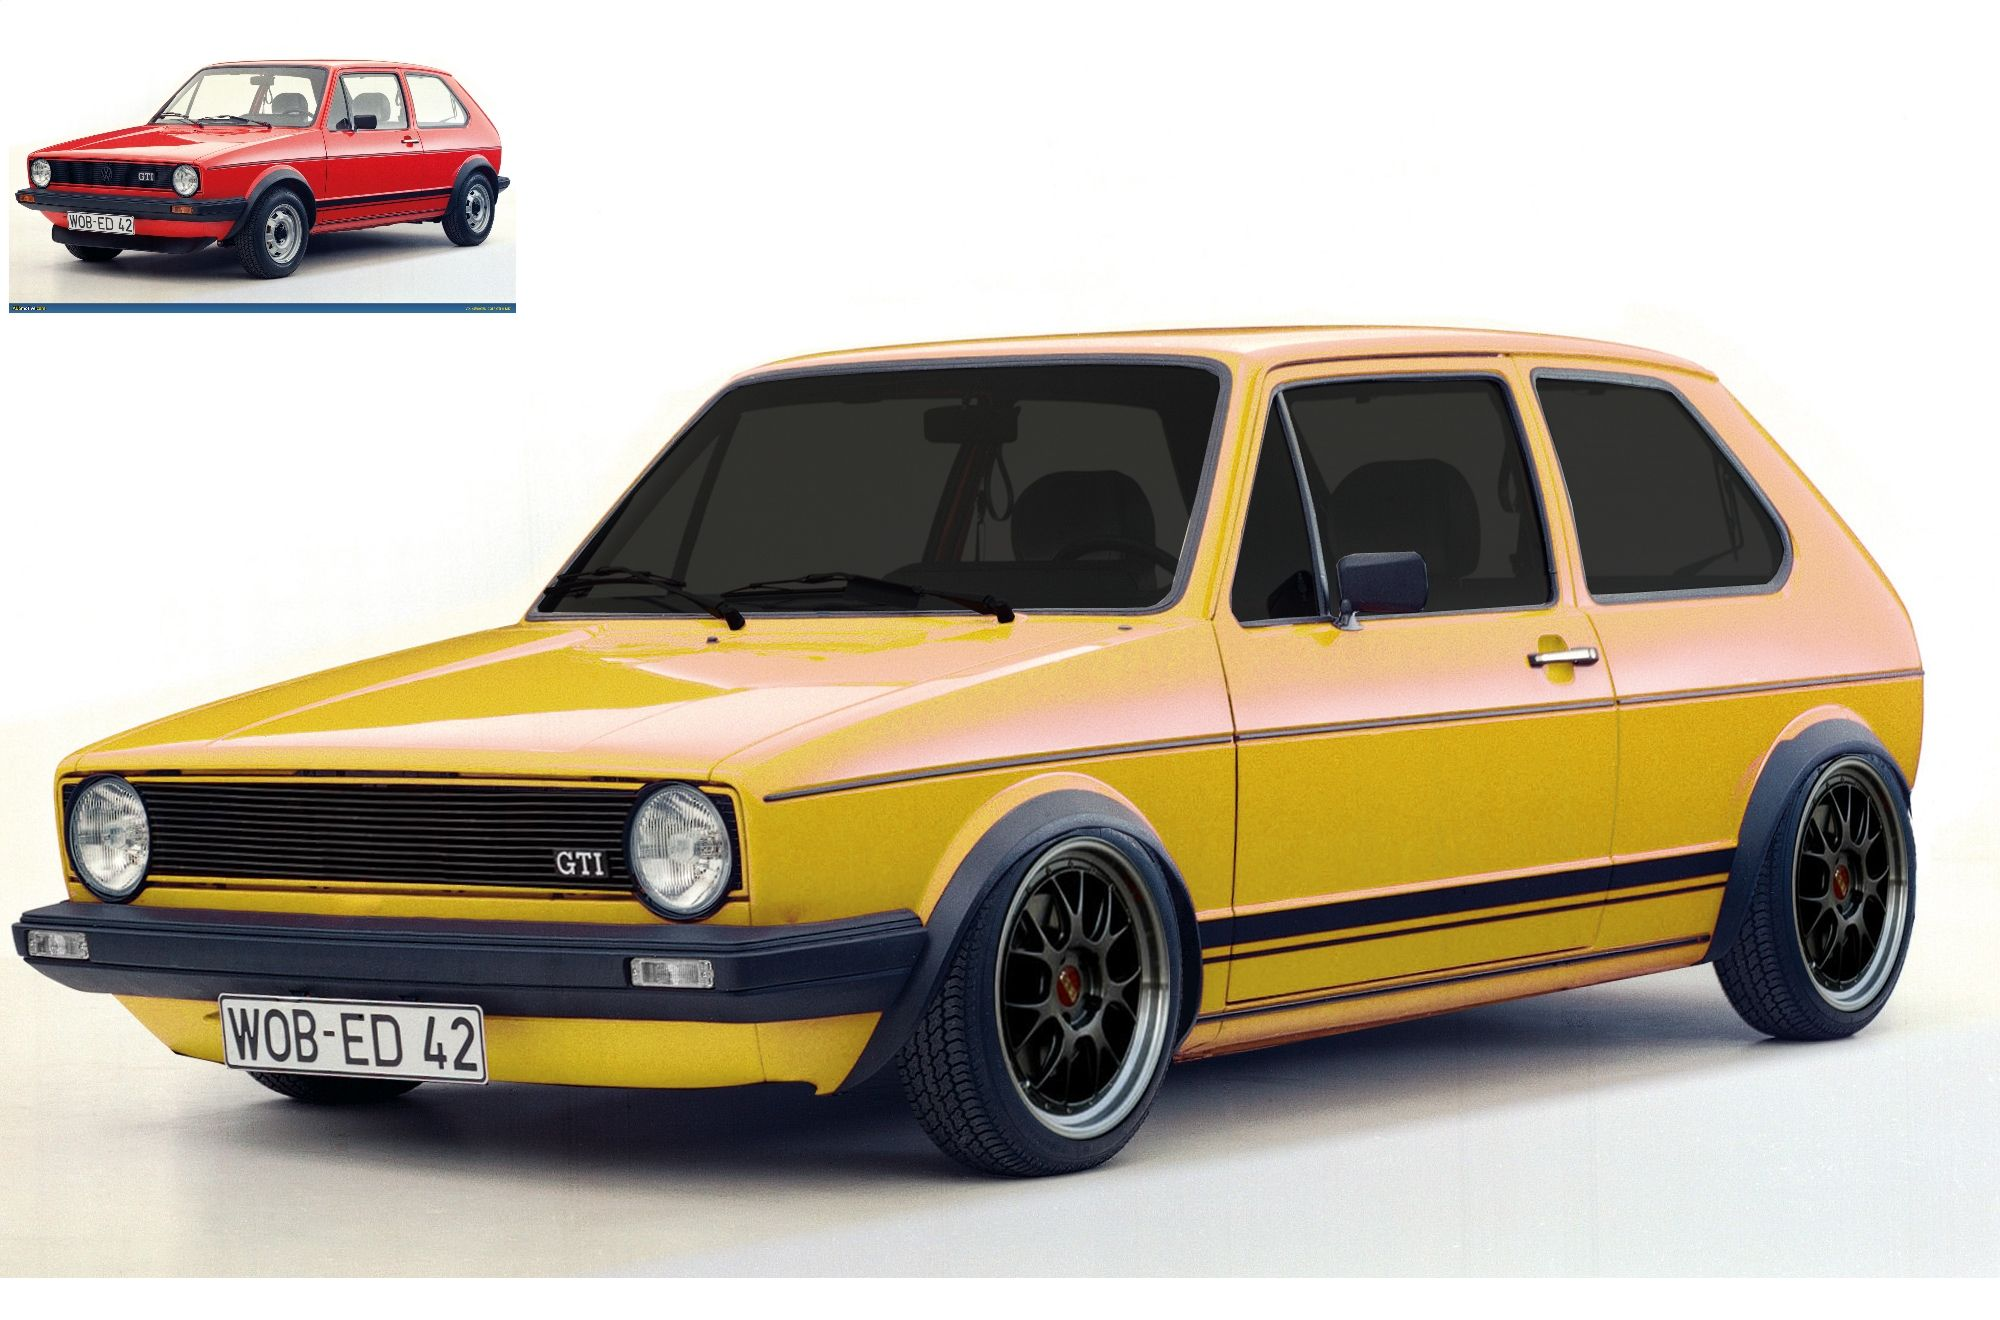 Vw Golf Gti Mk1 Golf Gti Mk1 Volkswagen Golf Mk1 Golf Gti